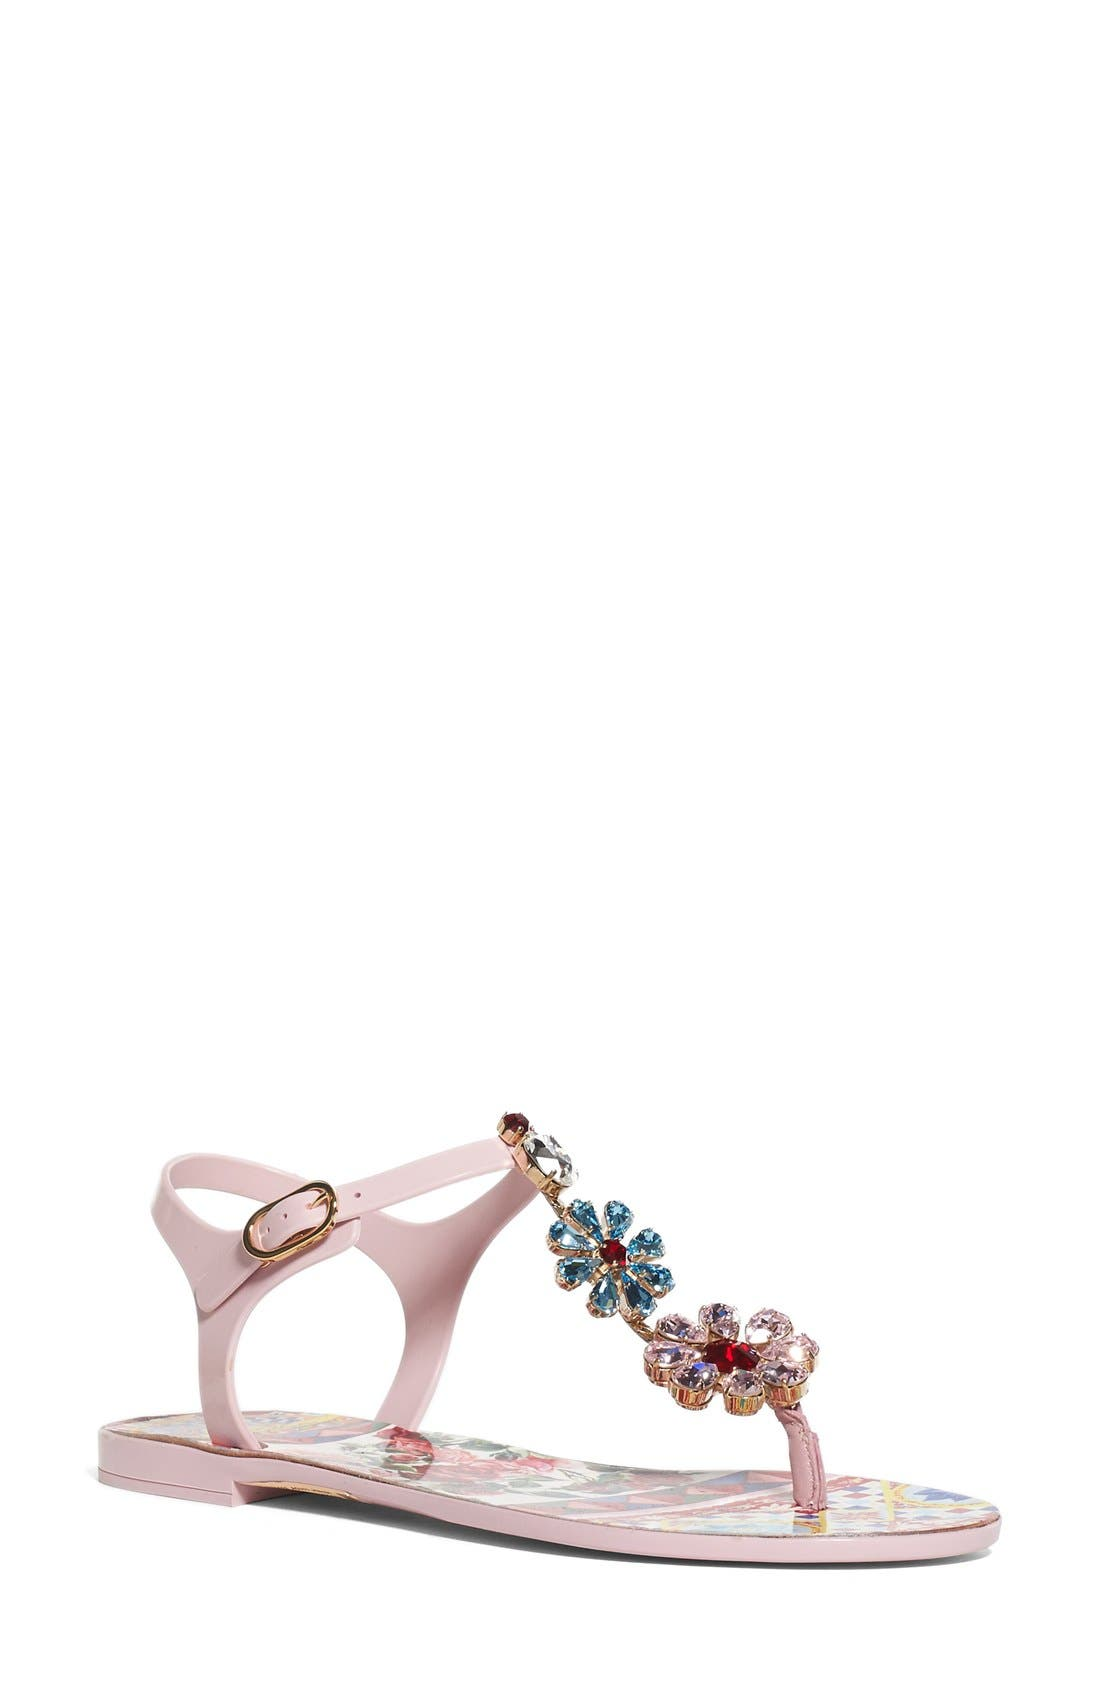 Main Image - Dolce&Gabbana Carretto Embellished Jelly Sandal (Women)